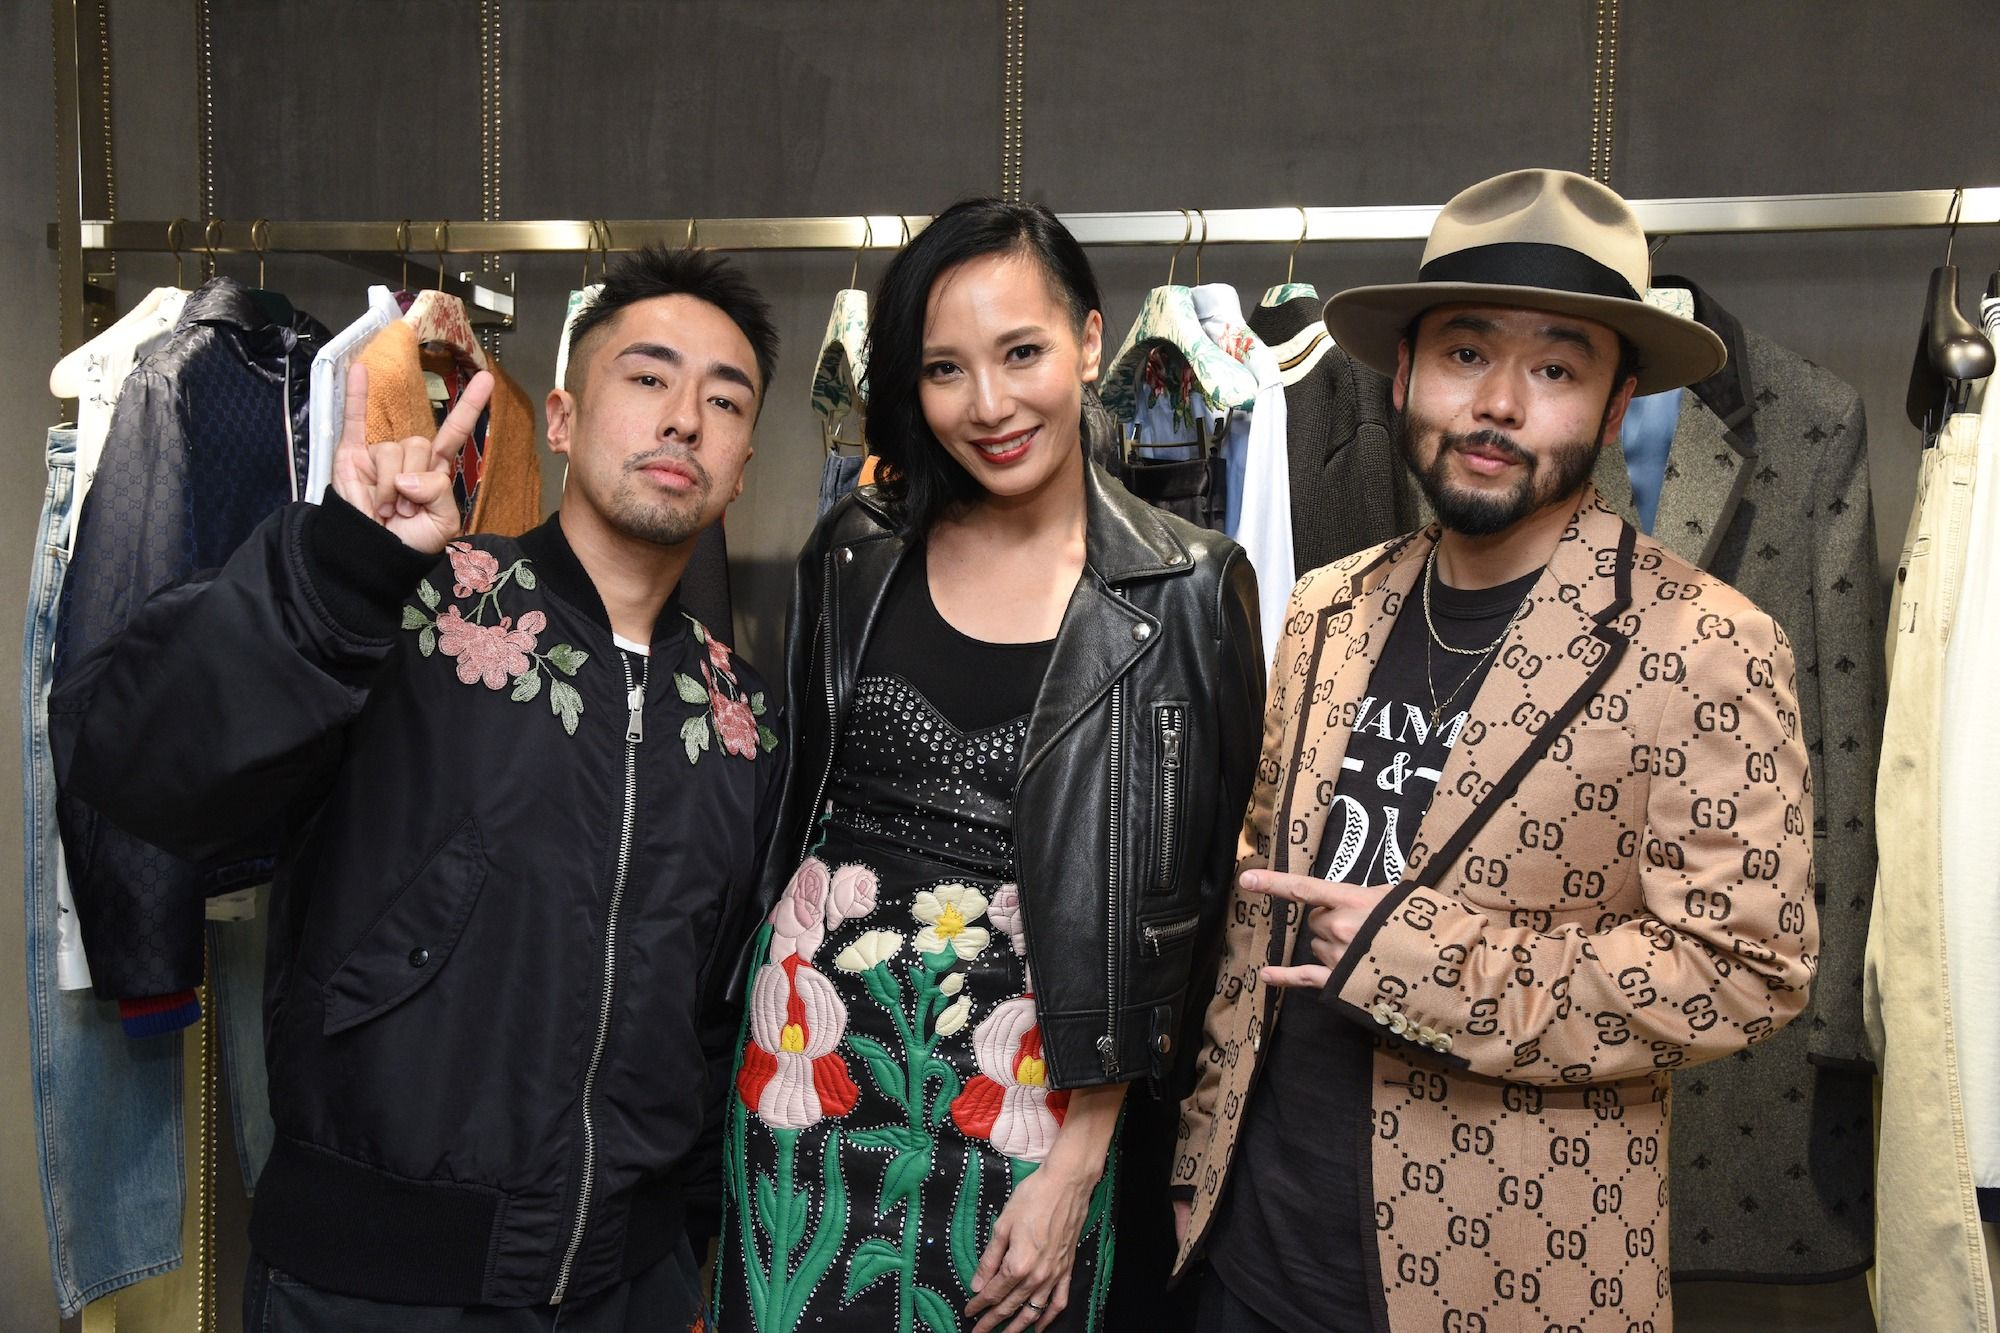 Kevin Poon, Jaime Ku, Motofumi Kogi